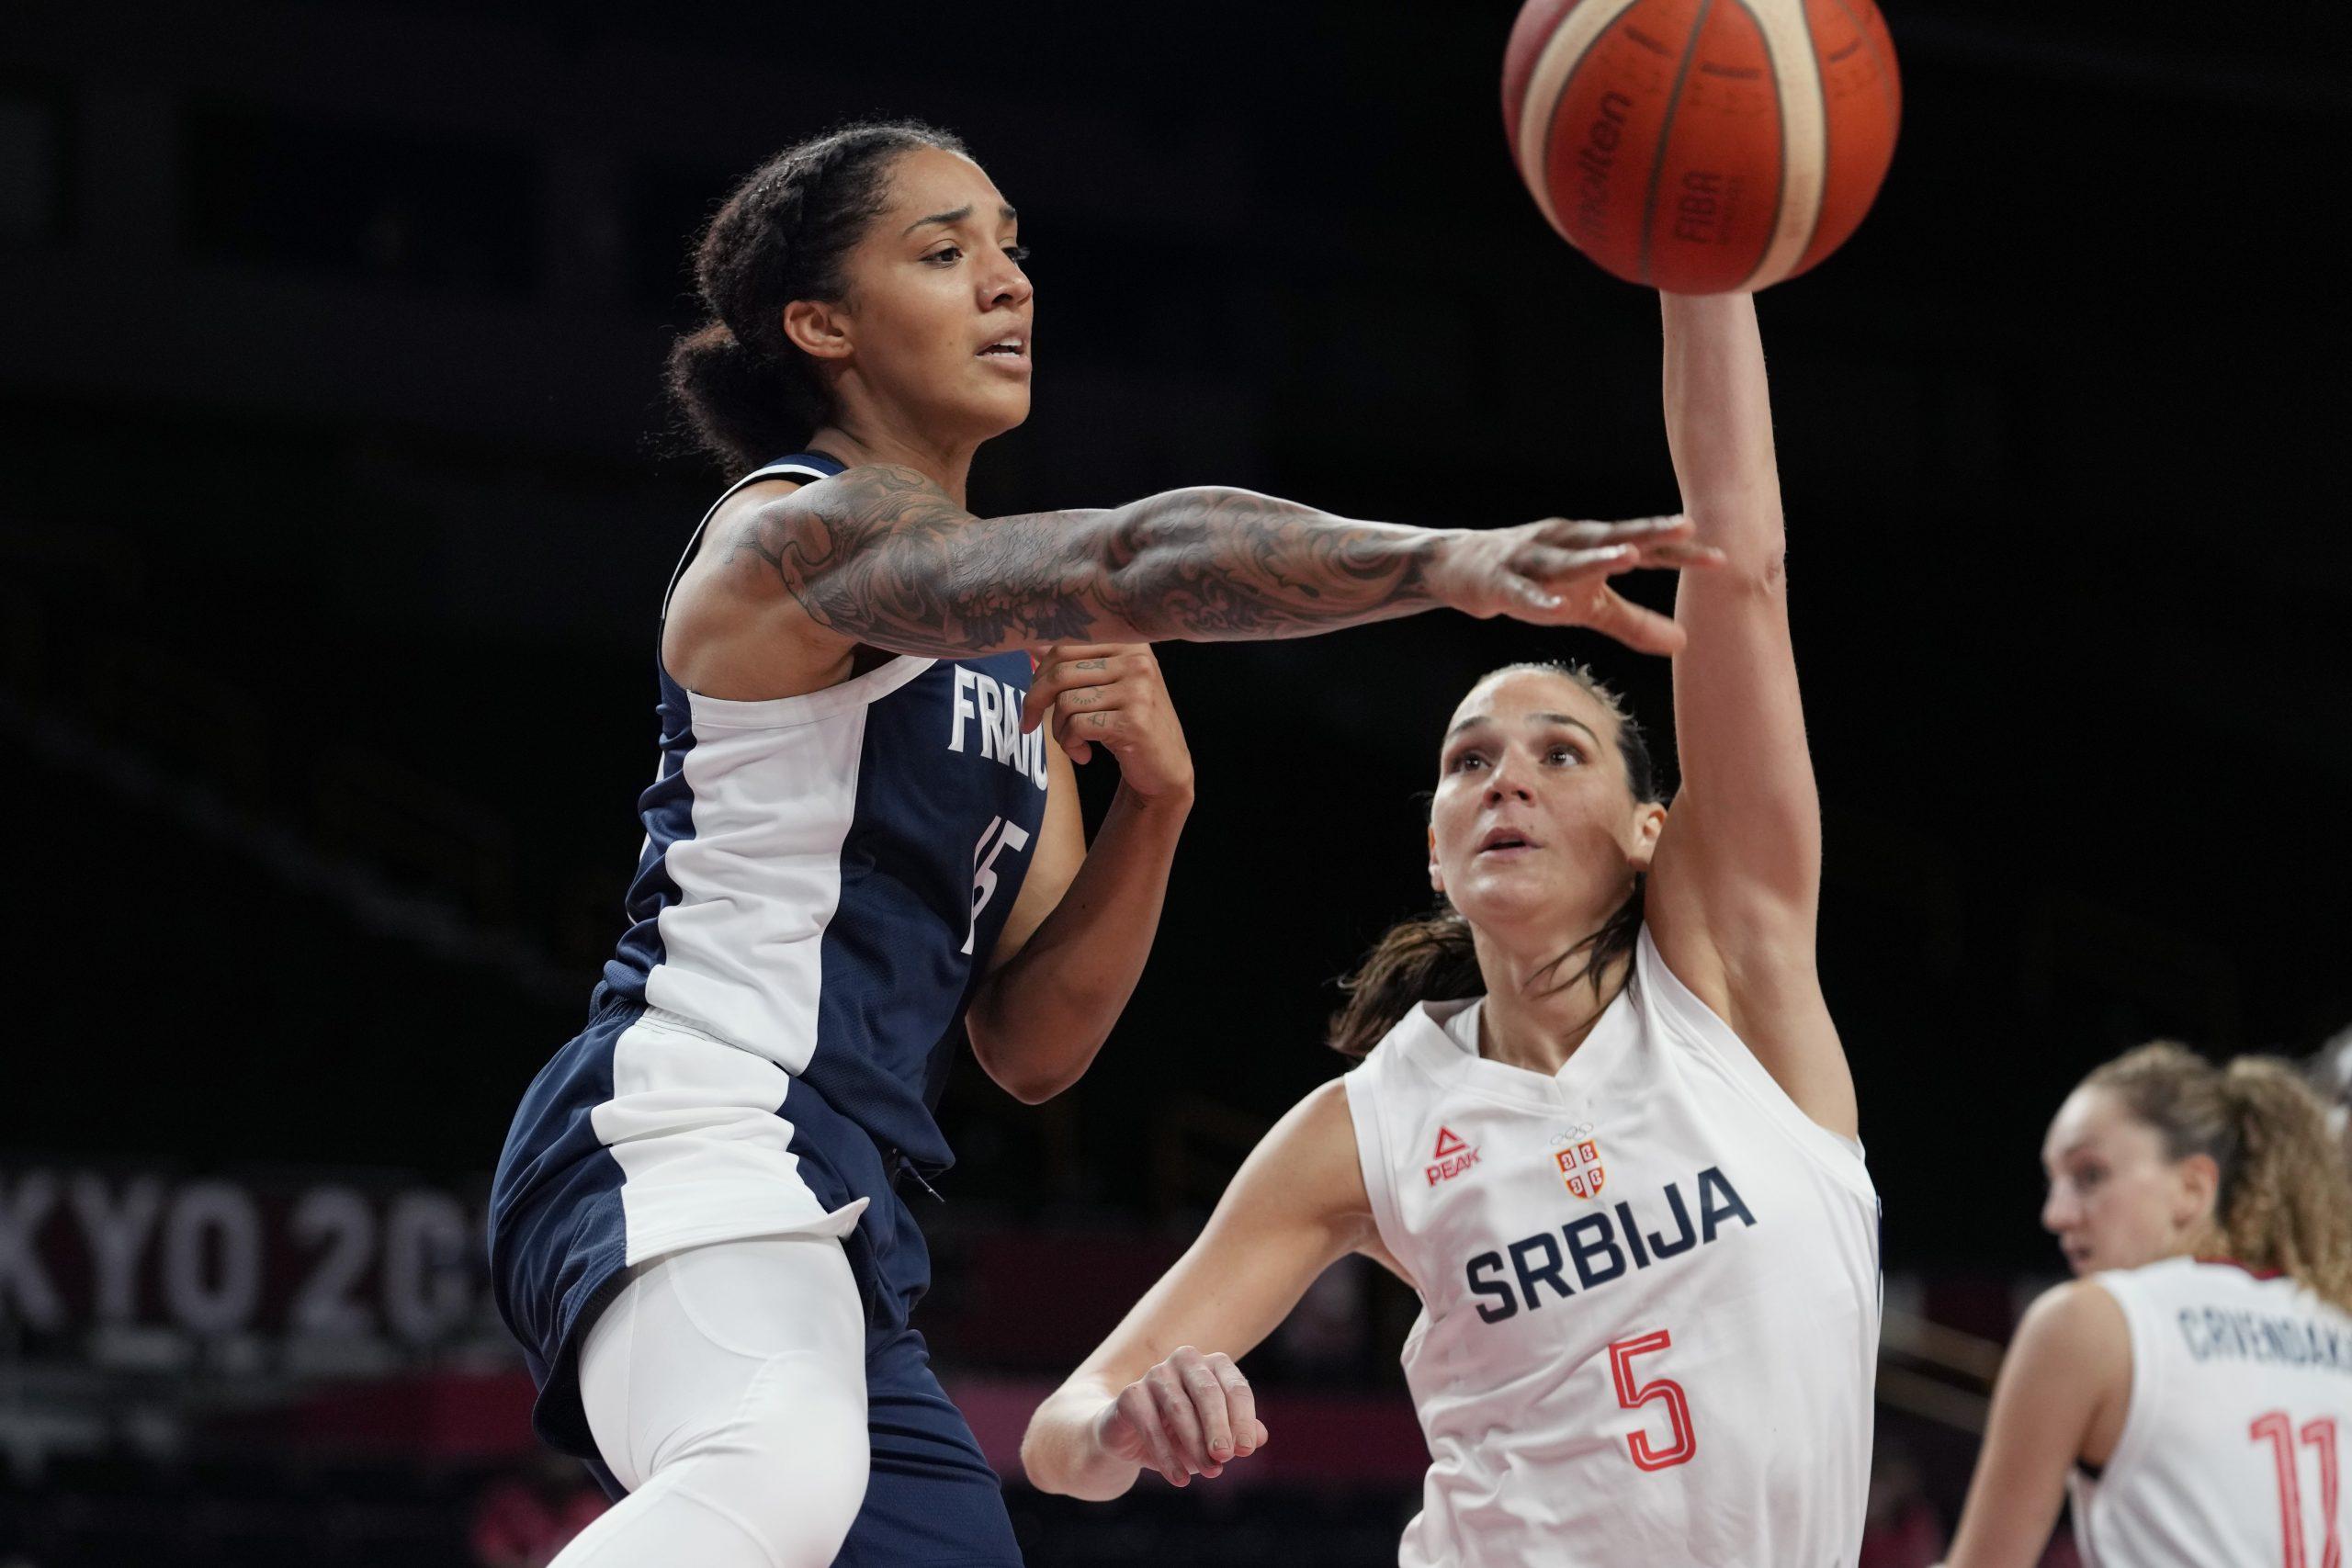 Ženska košarkaška reprezenetacija Srbije, Sonja Vasić